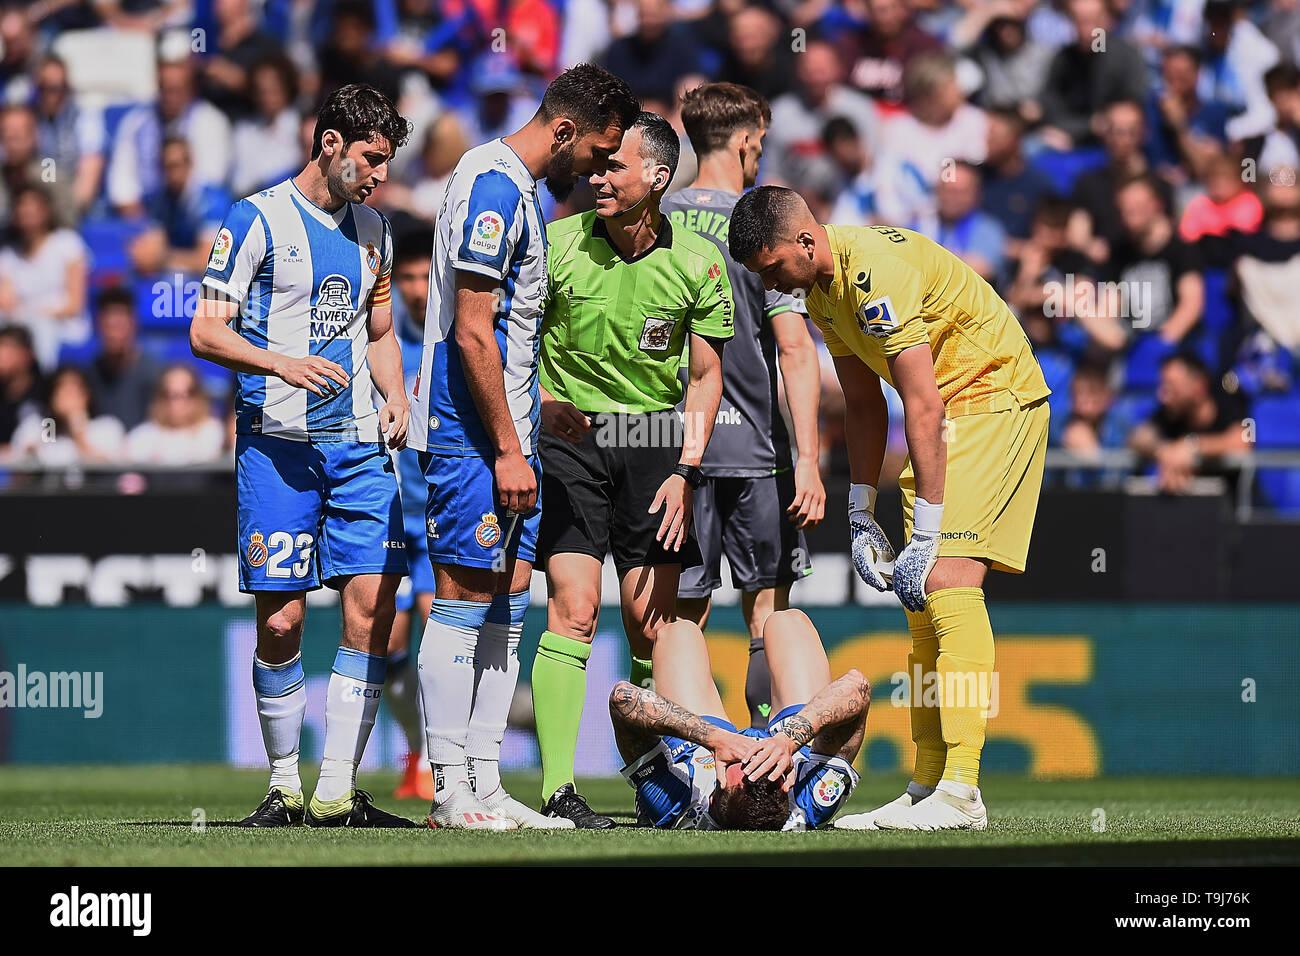 Sergi Darder of RCD Espanyol during the match between RCD Espanyol vs Real Sociedad of LaLiga, date 38, 2018-2019 season. RCDE Stadium. Barcelona, Spain - 18 may 2019 - Stock Image